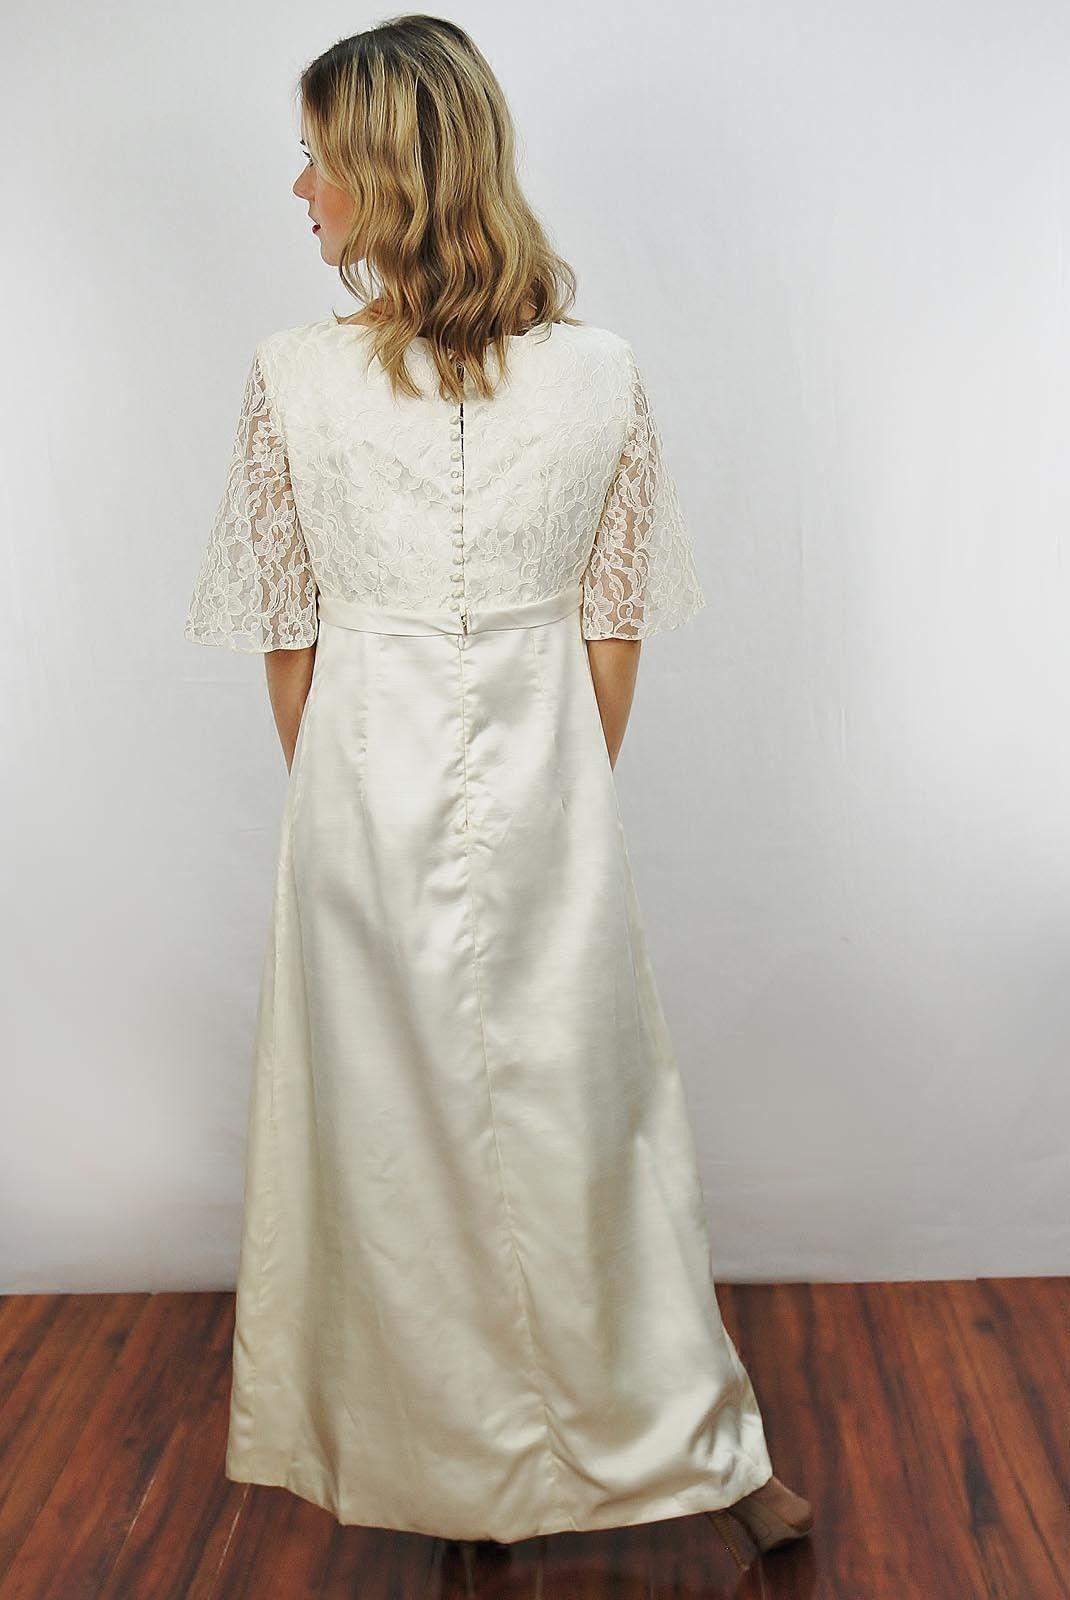 Mod wedding dress  Vtg  s White Lace Slv Mod Empire Wedding Bridal Party Maxi Dress